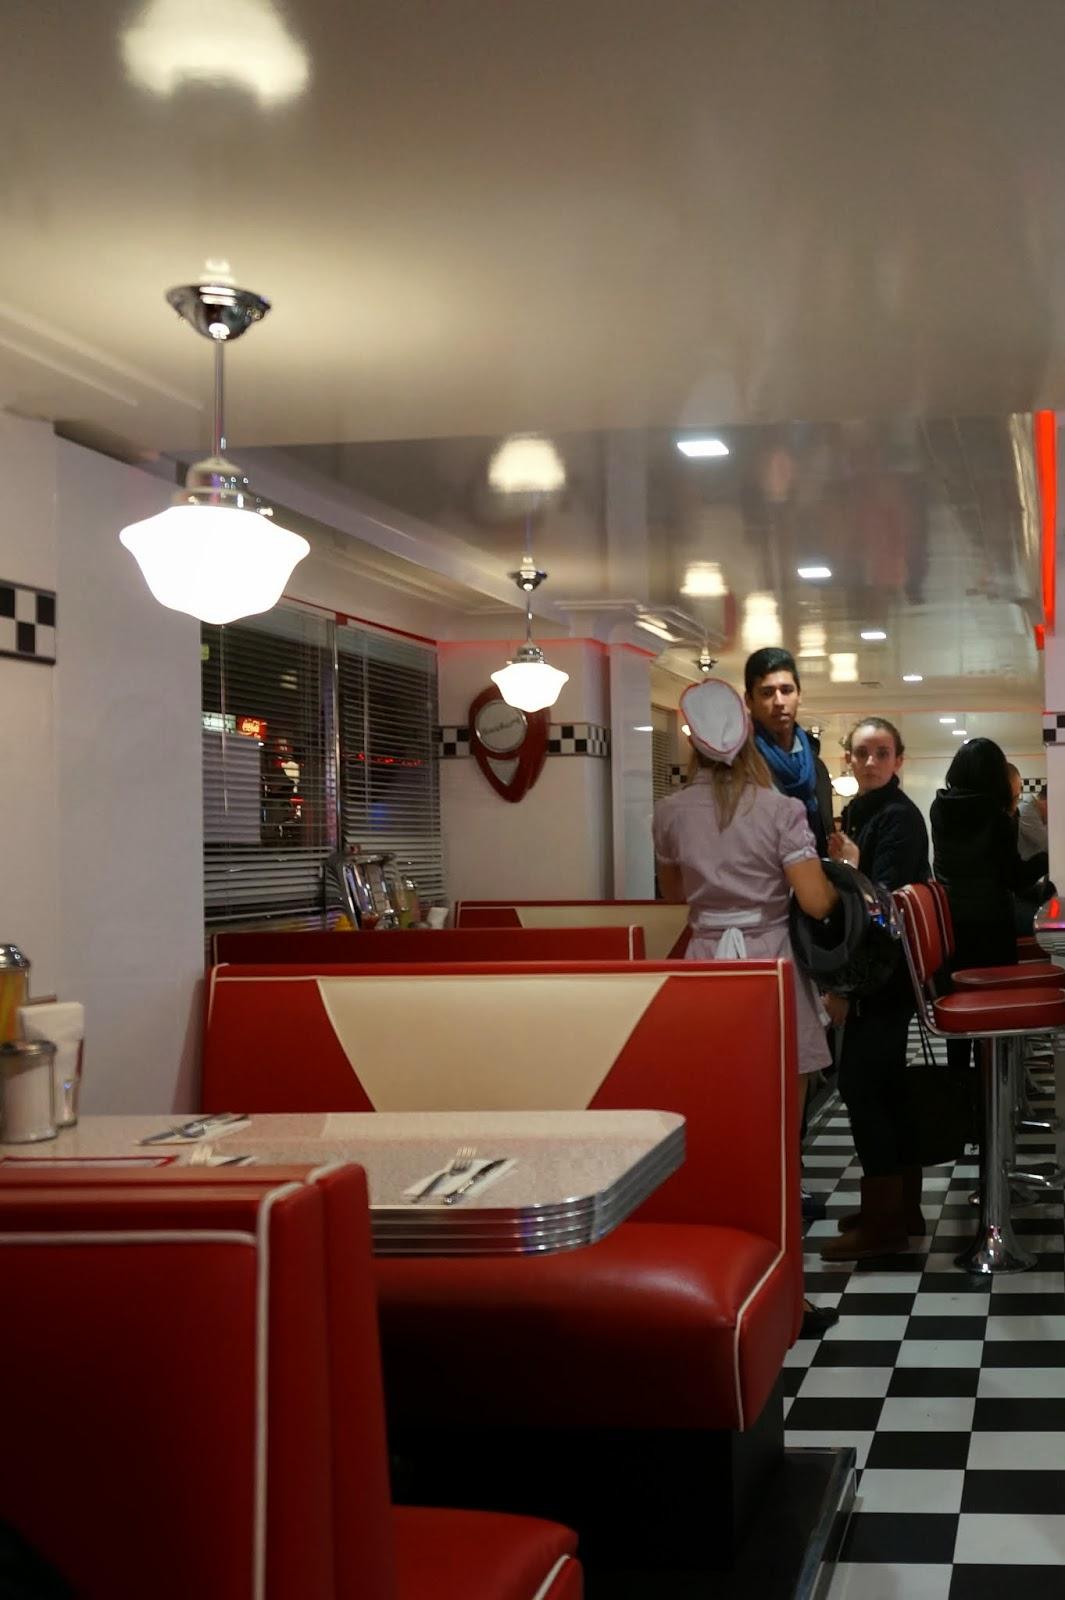 Captured Memories: The American Dream Diner